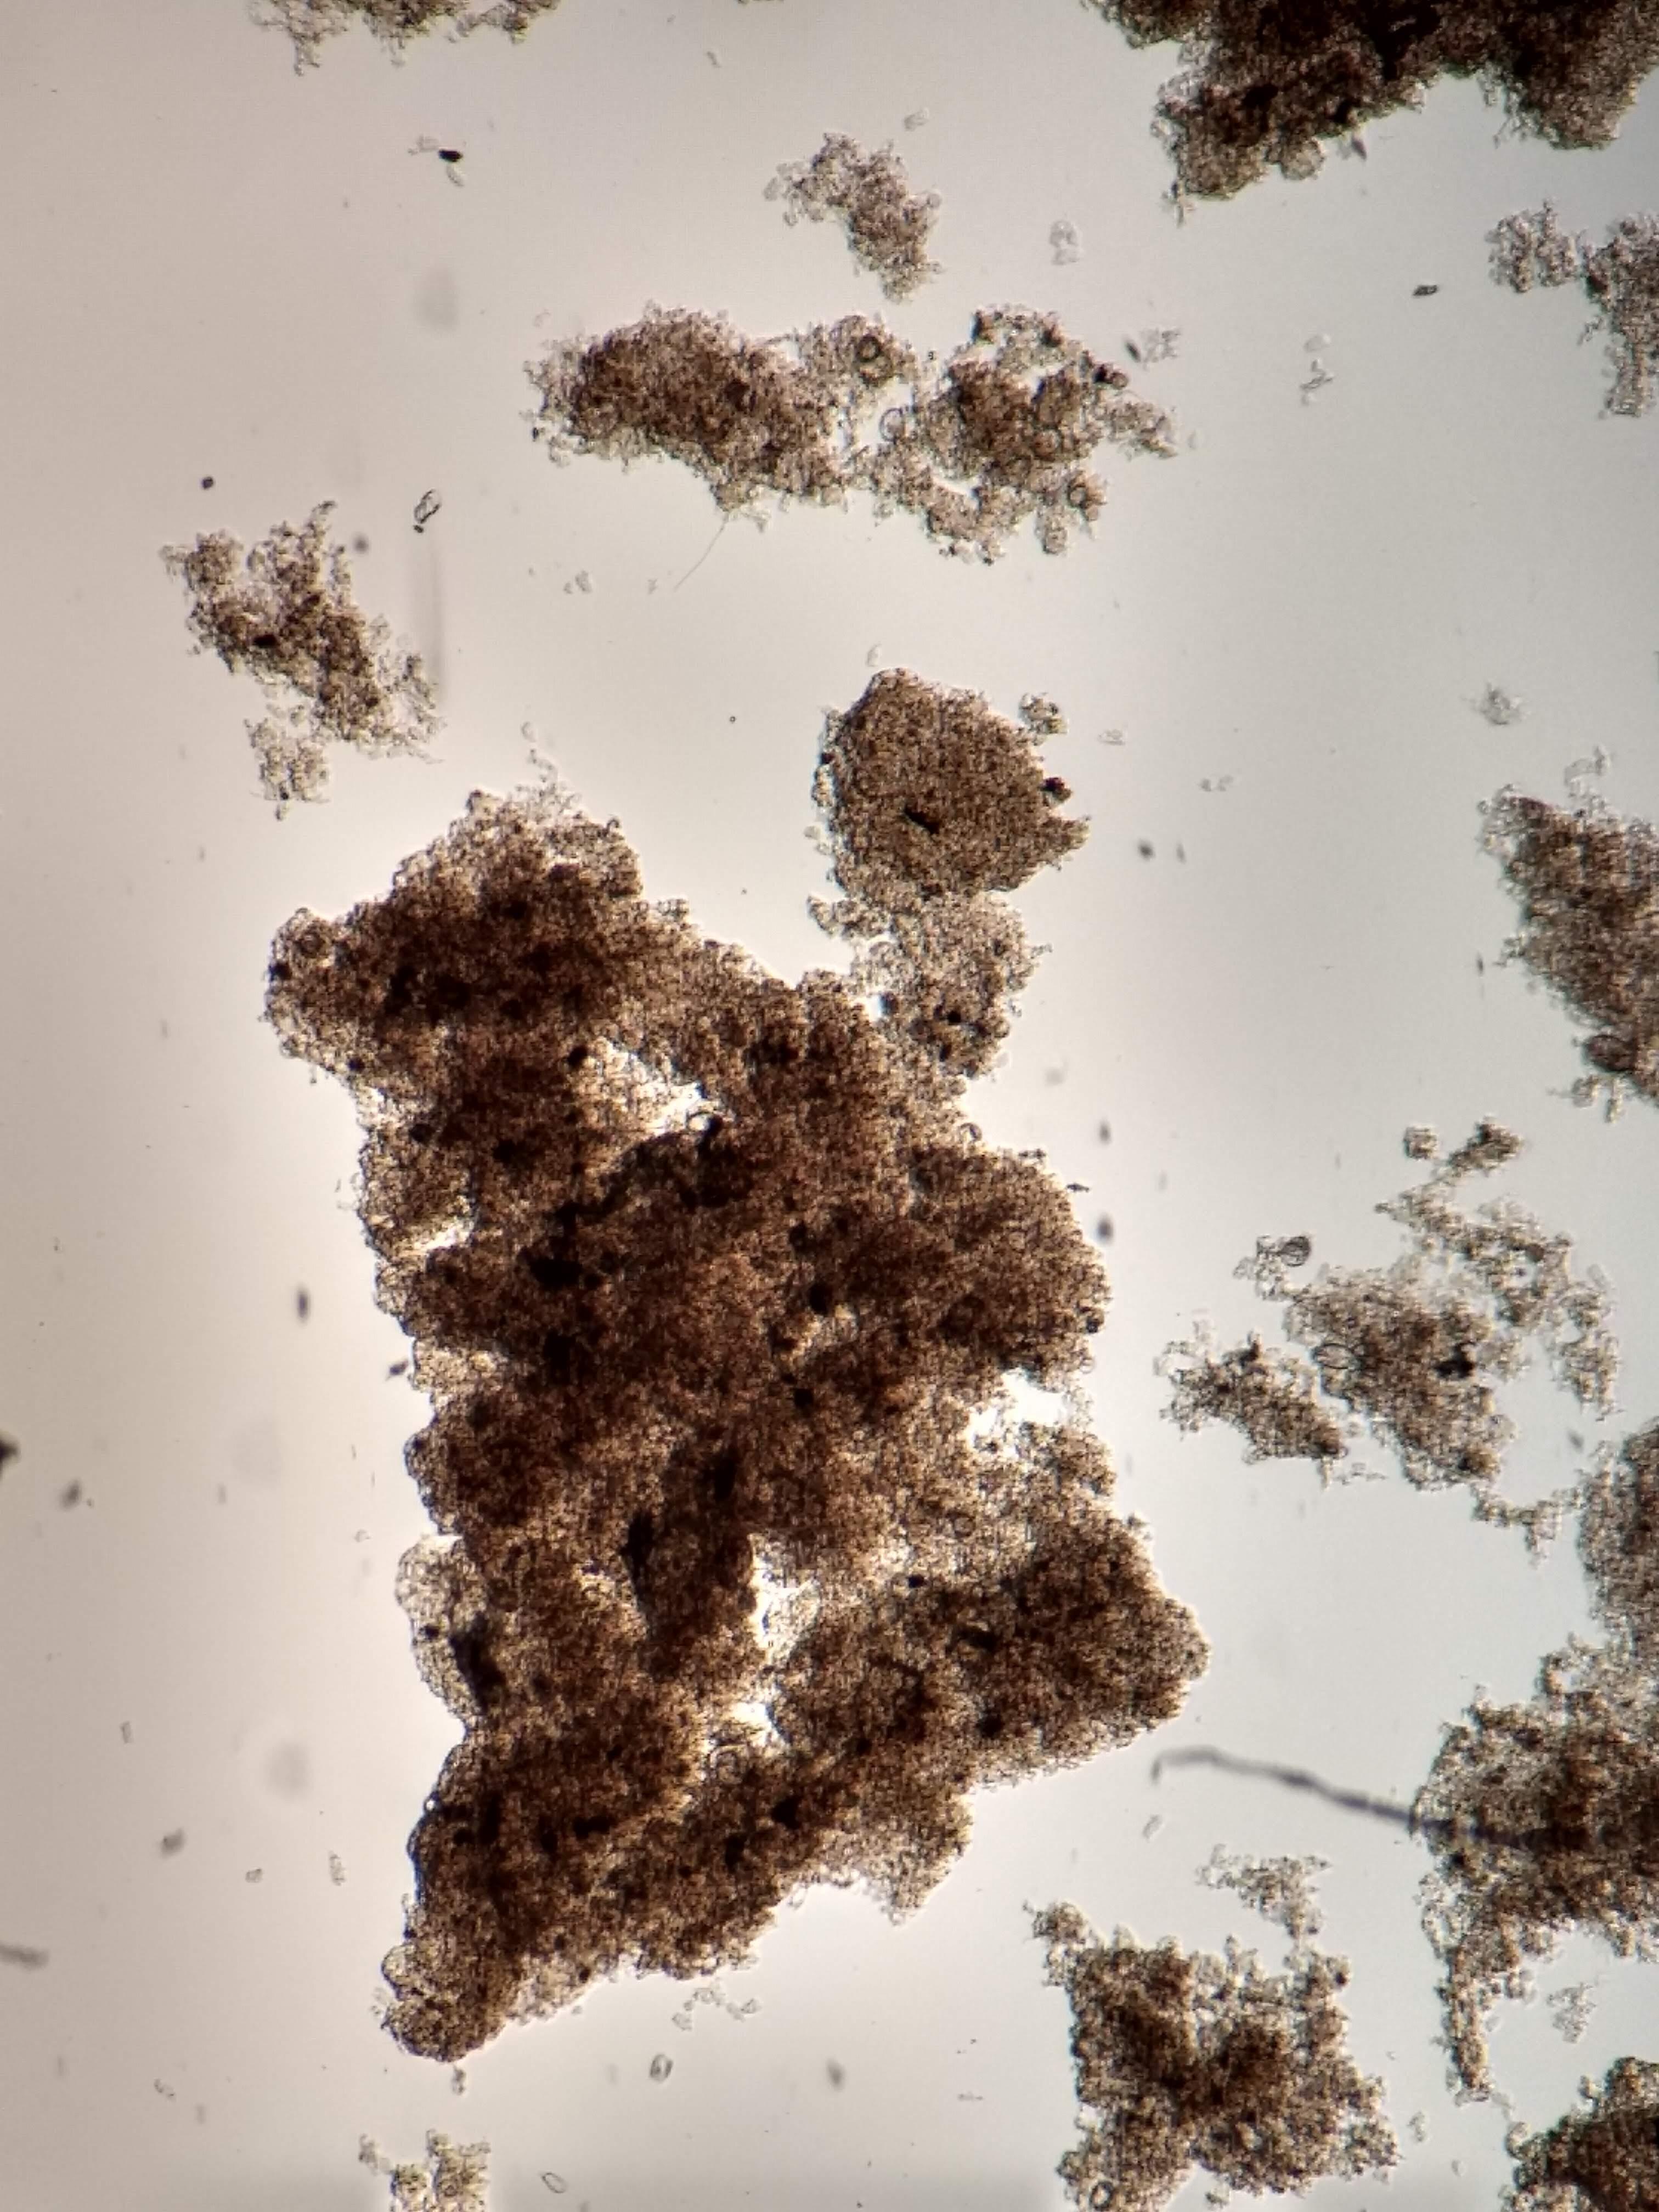 Característica do floco biológico